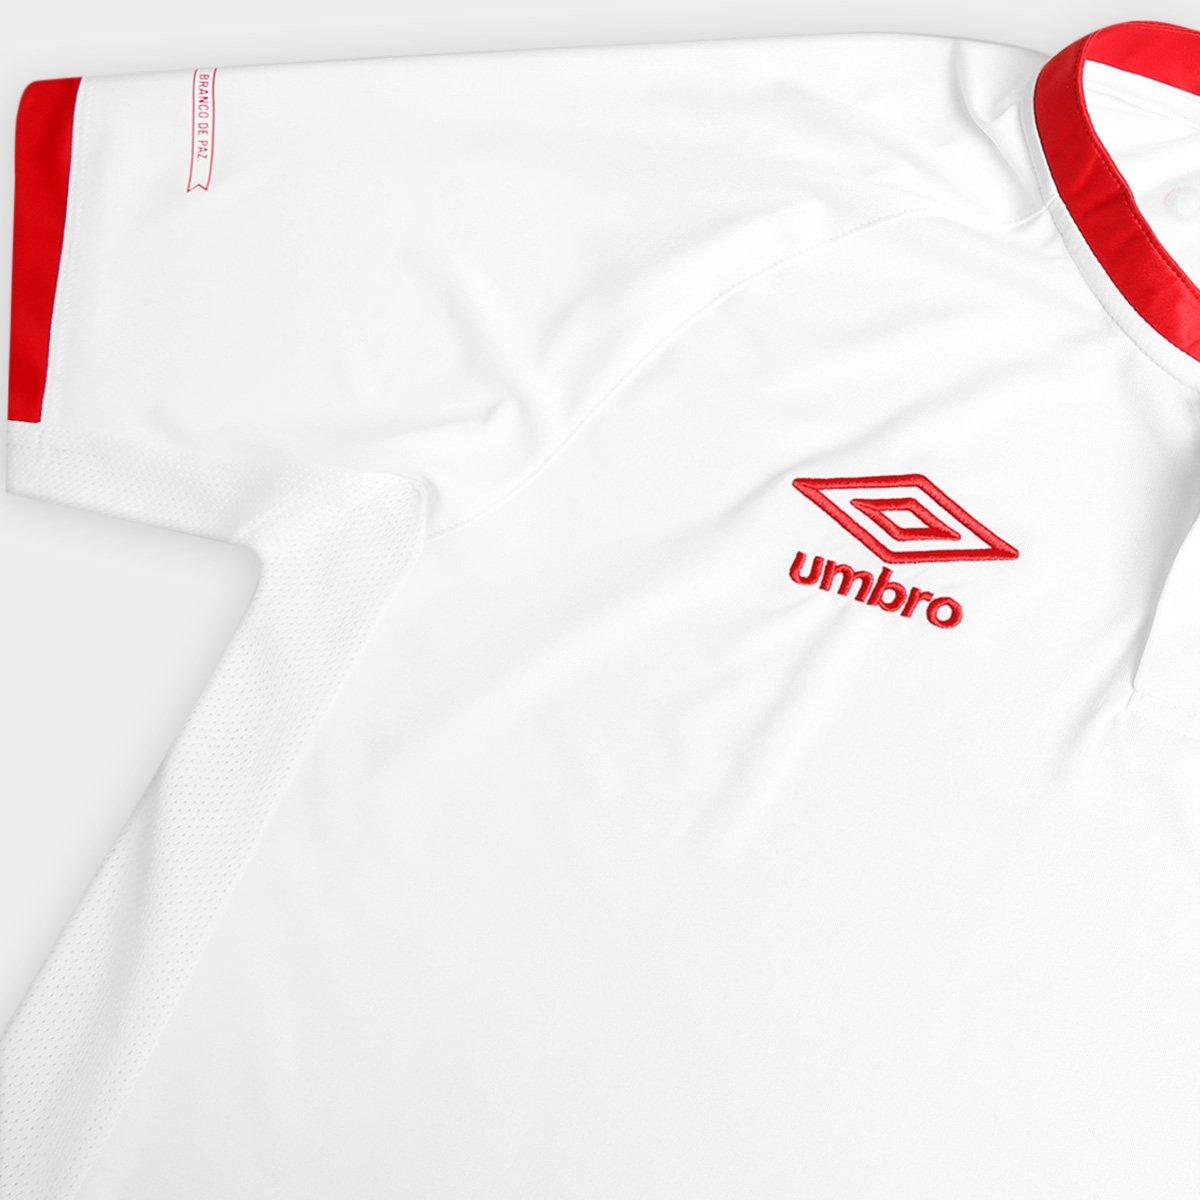 Camisa Náutico II 2015 s nº Torcedor Umbro Masculina - Compre Agora ... f281e96a708be